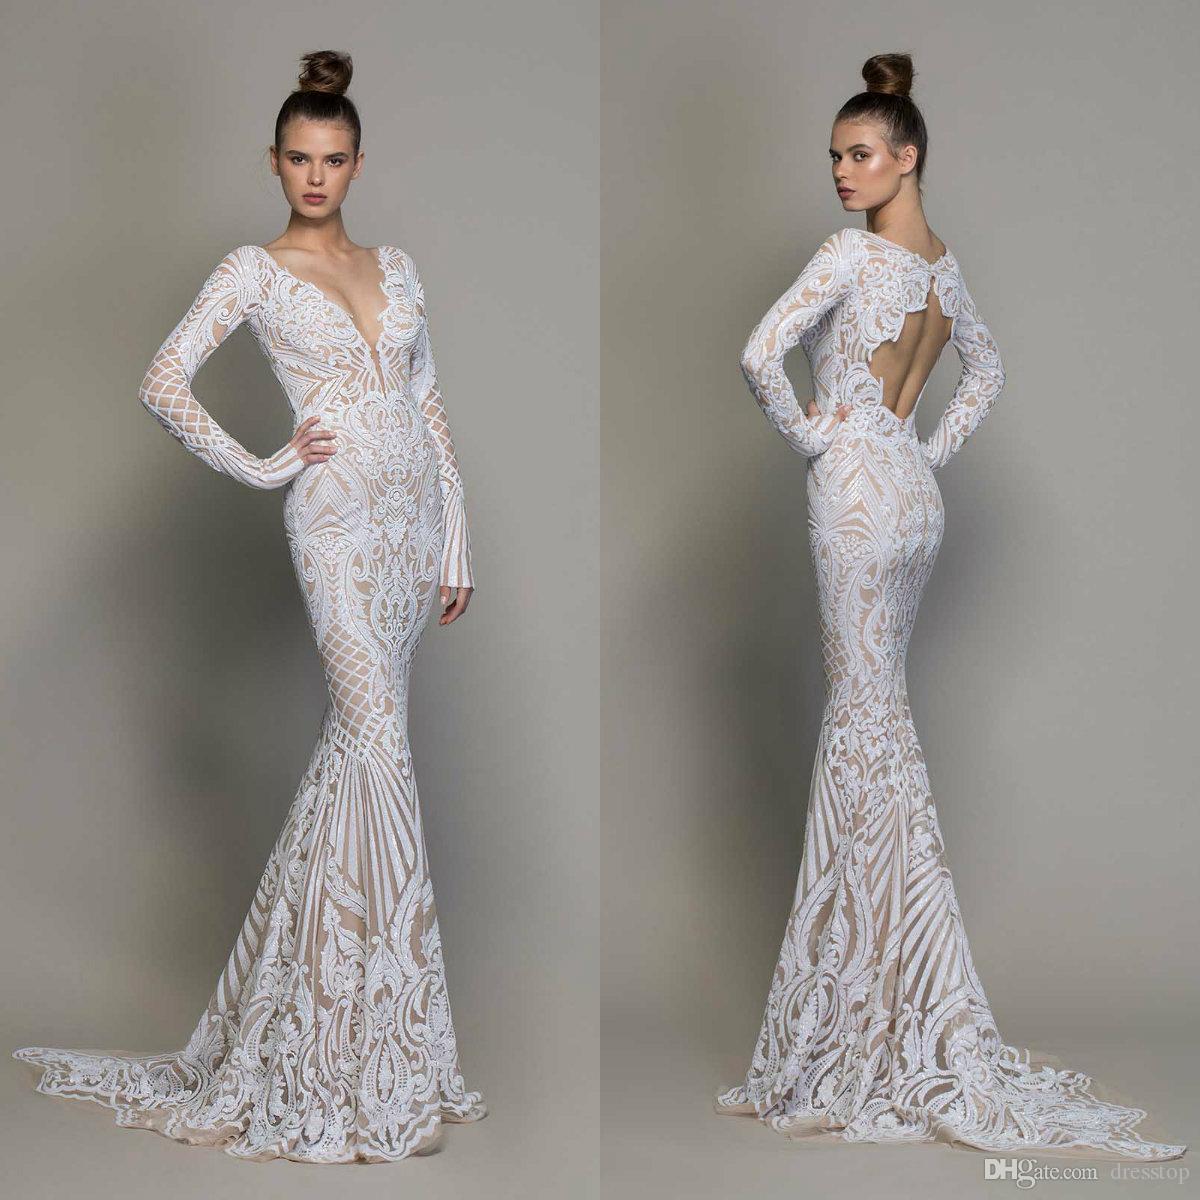 High Fashion Mermaid Wedding Dresses Long Sleeves Illusion Lace Sexy Vestido De Novia Pnina Tornai 2020 Open Back Beach Wedding Gowns